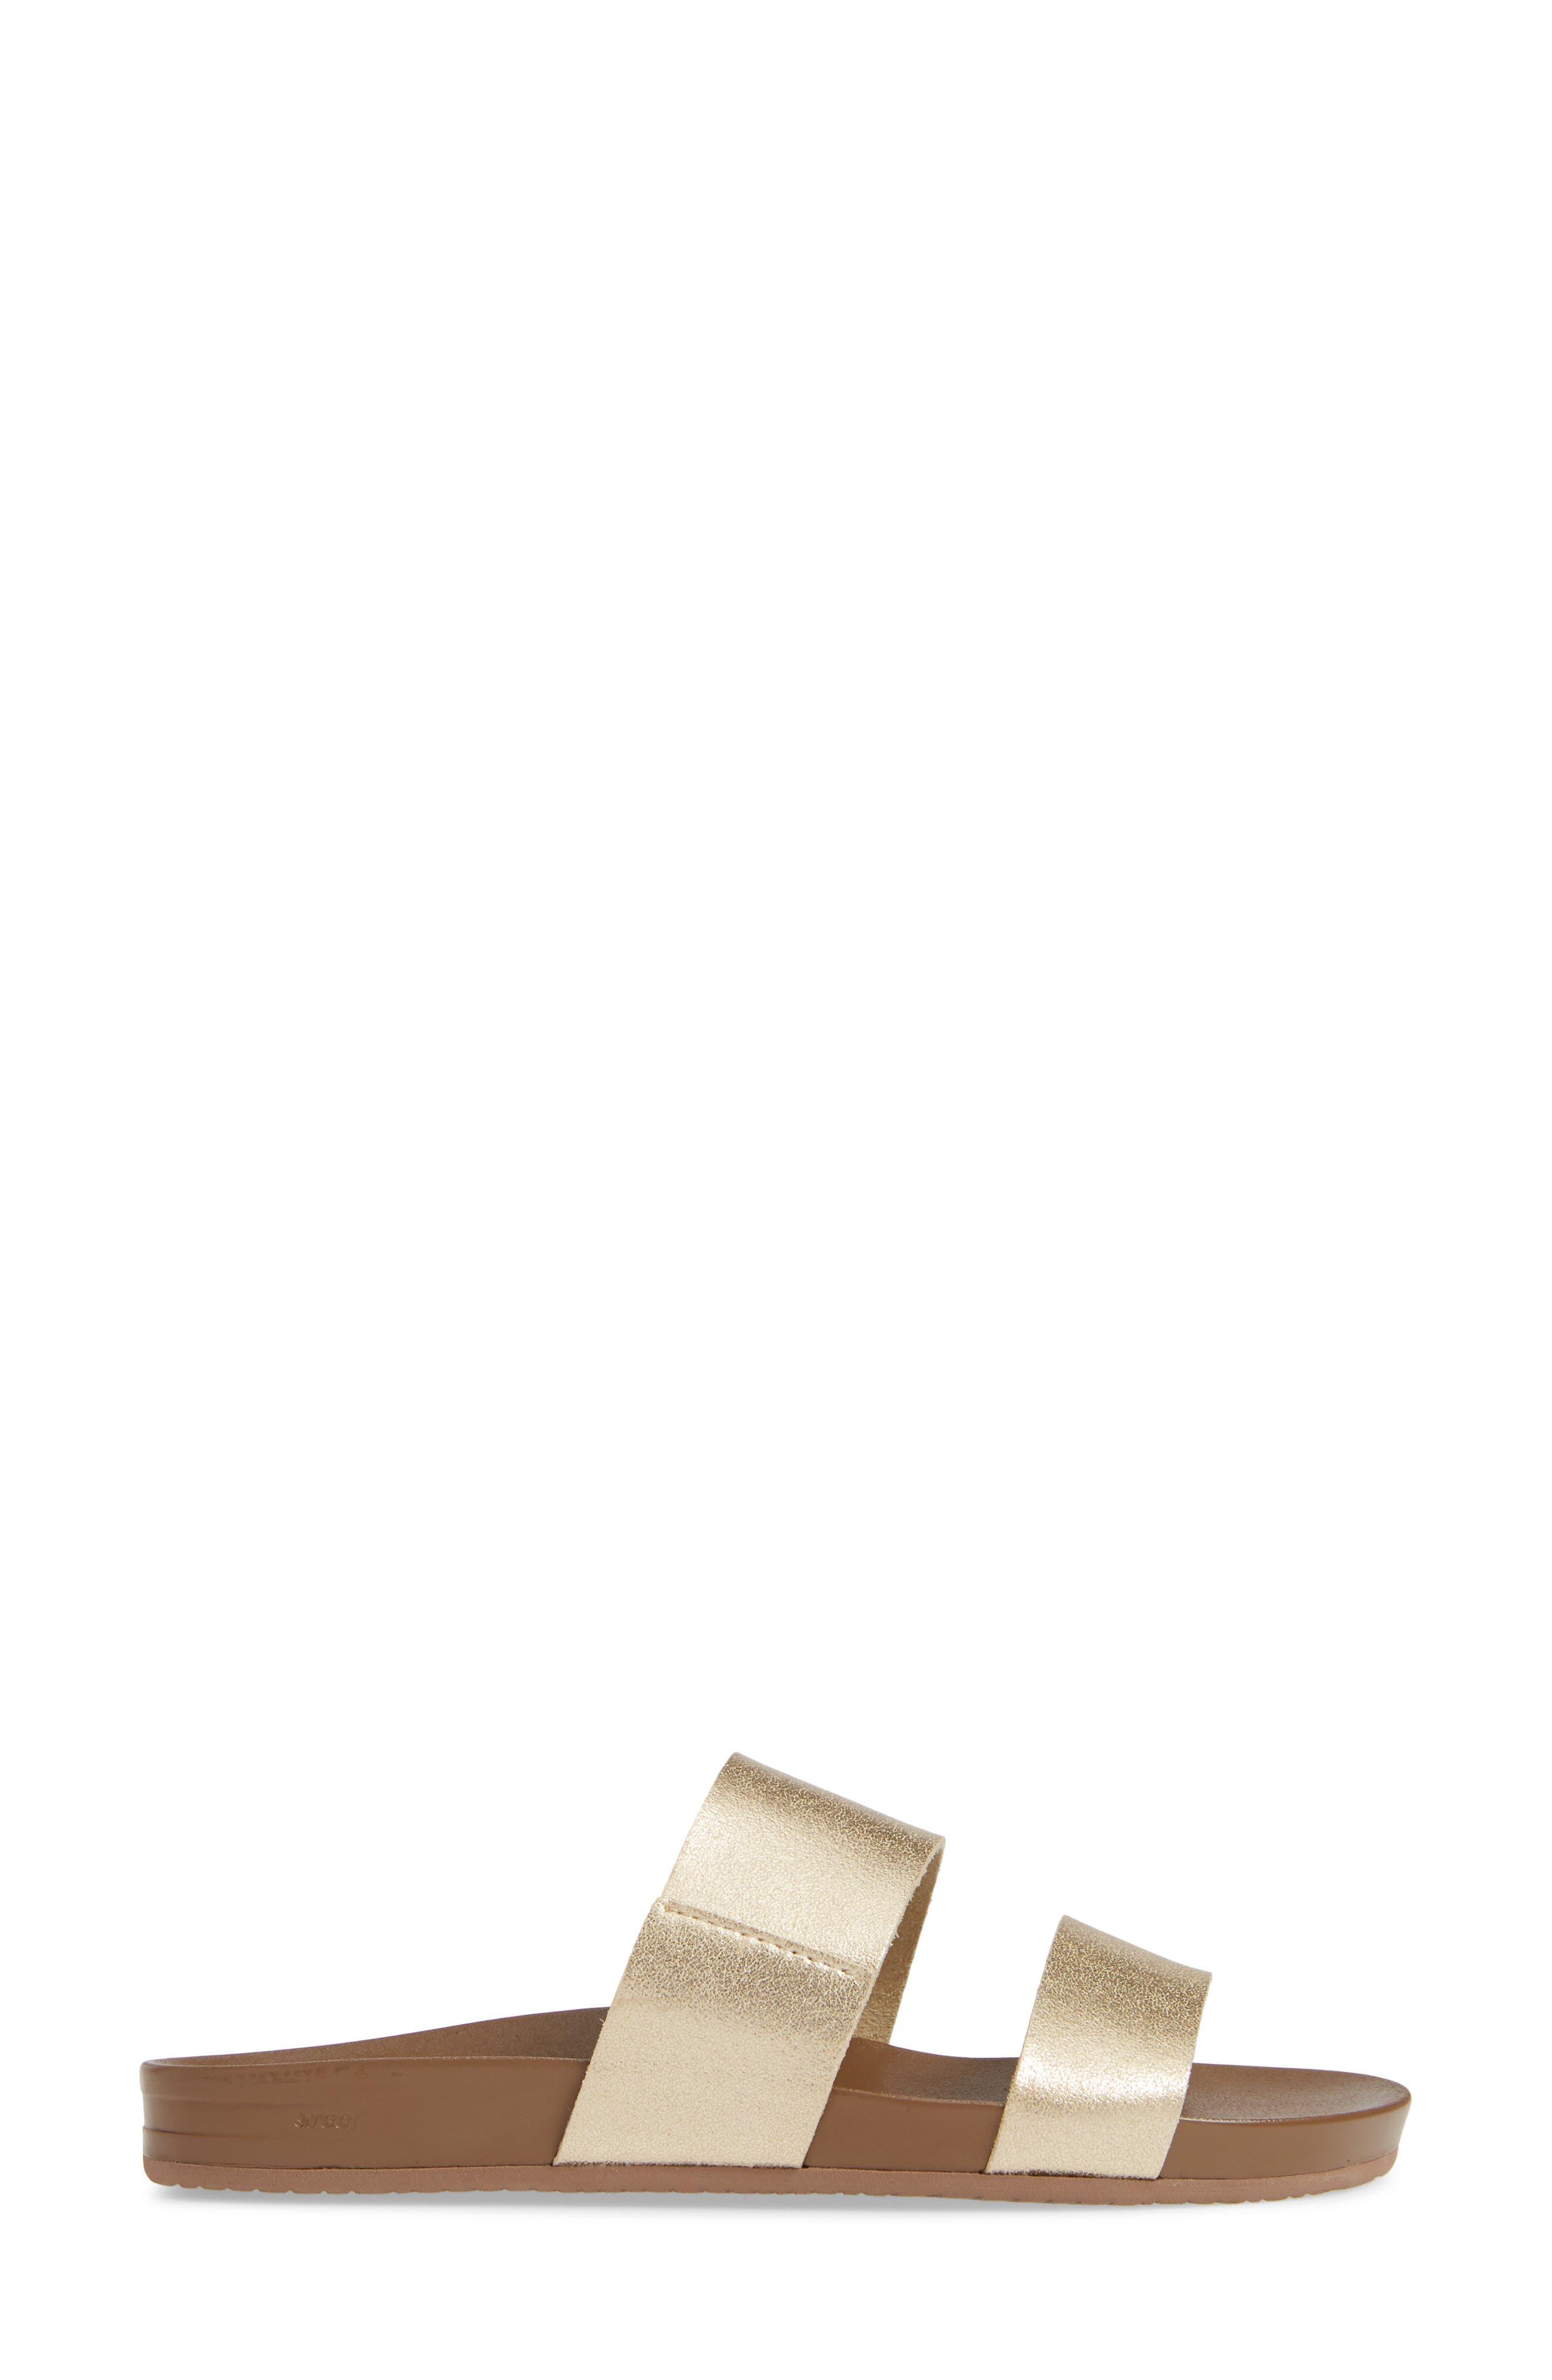 REEF,                             Cushion Bounce Vista Slide Sandal,                             Alternate thumbnail 3, color,                             710